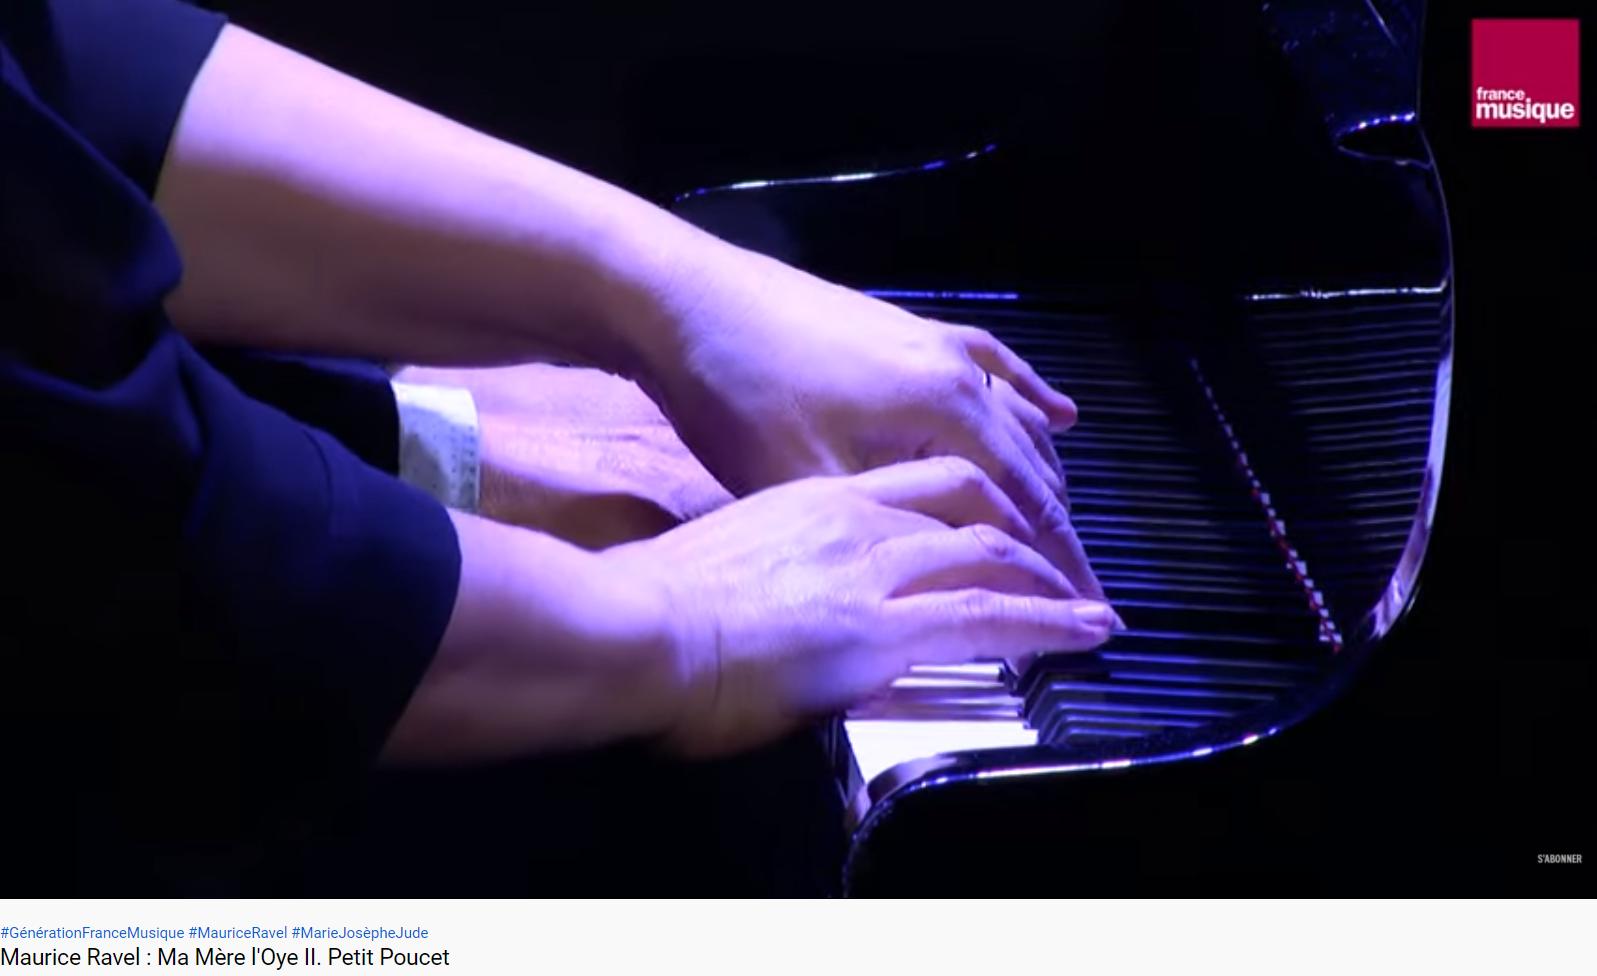 Ravel Ma Mère l'Oye Petit Poucet